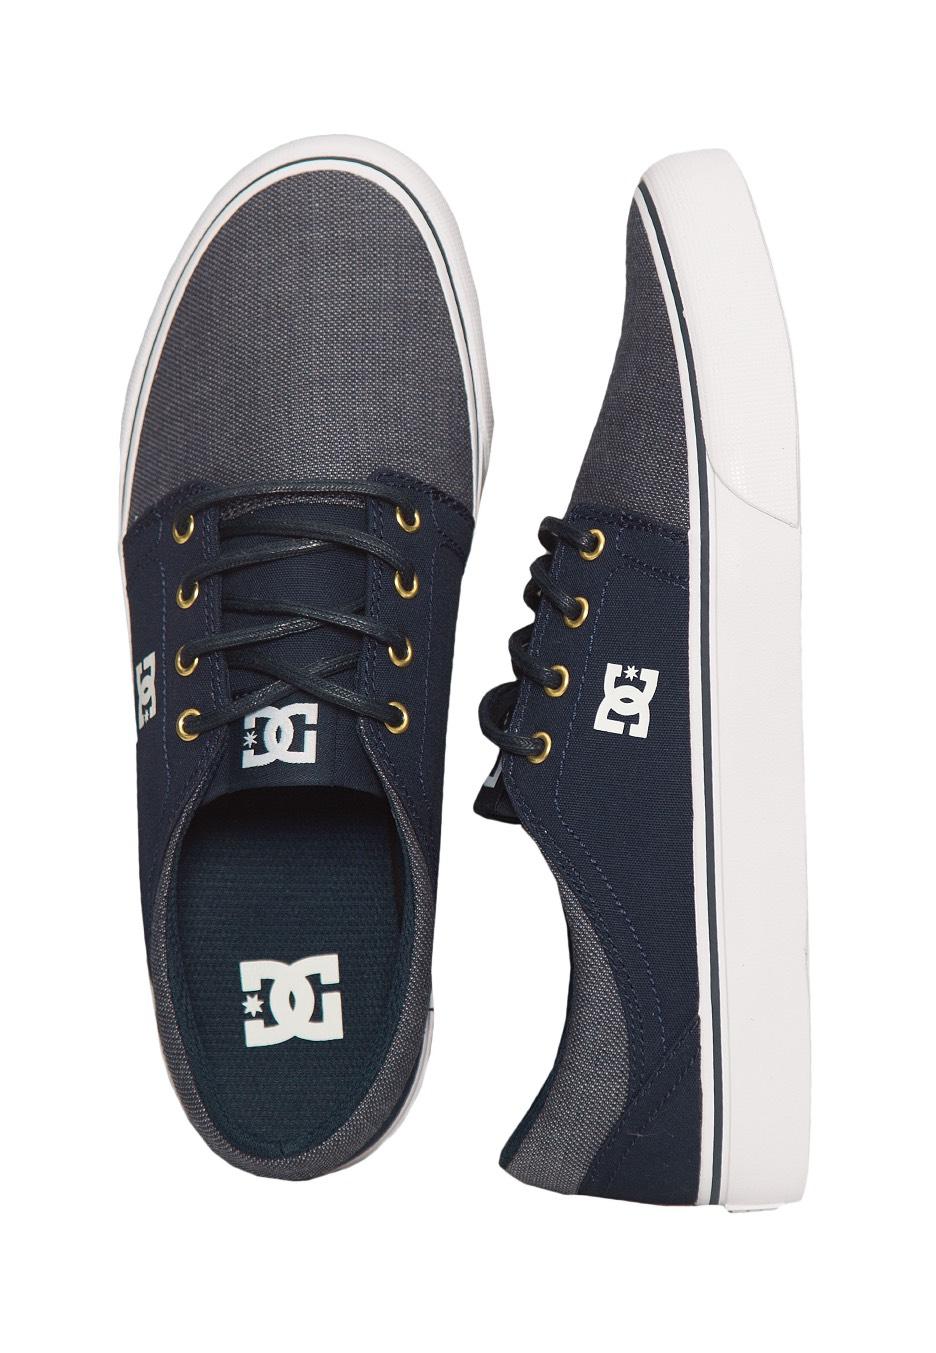 DC - Trase TX SE Navy Gold - Shoes - Impericon.com UK dedb2a8c5e